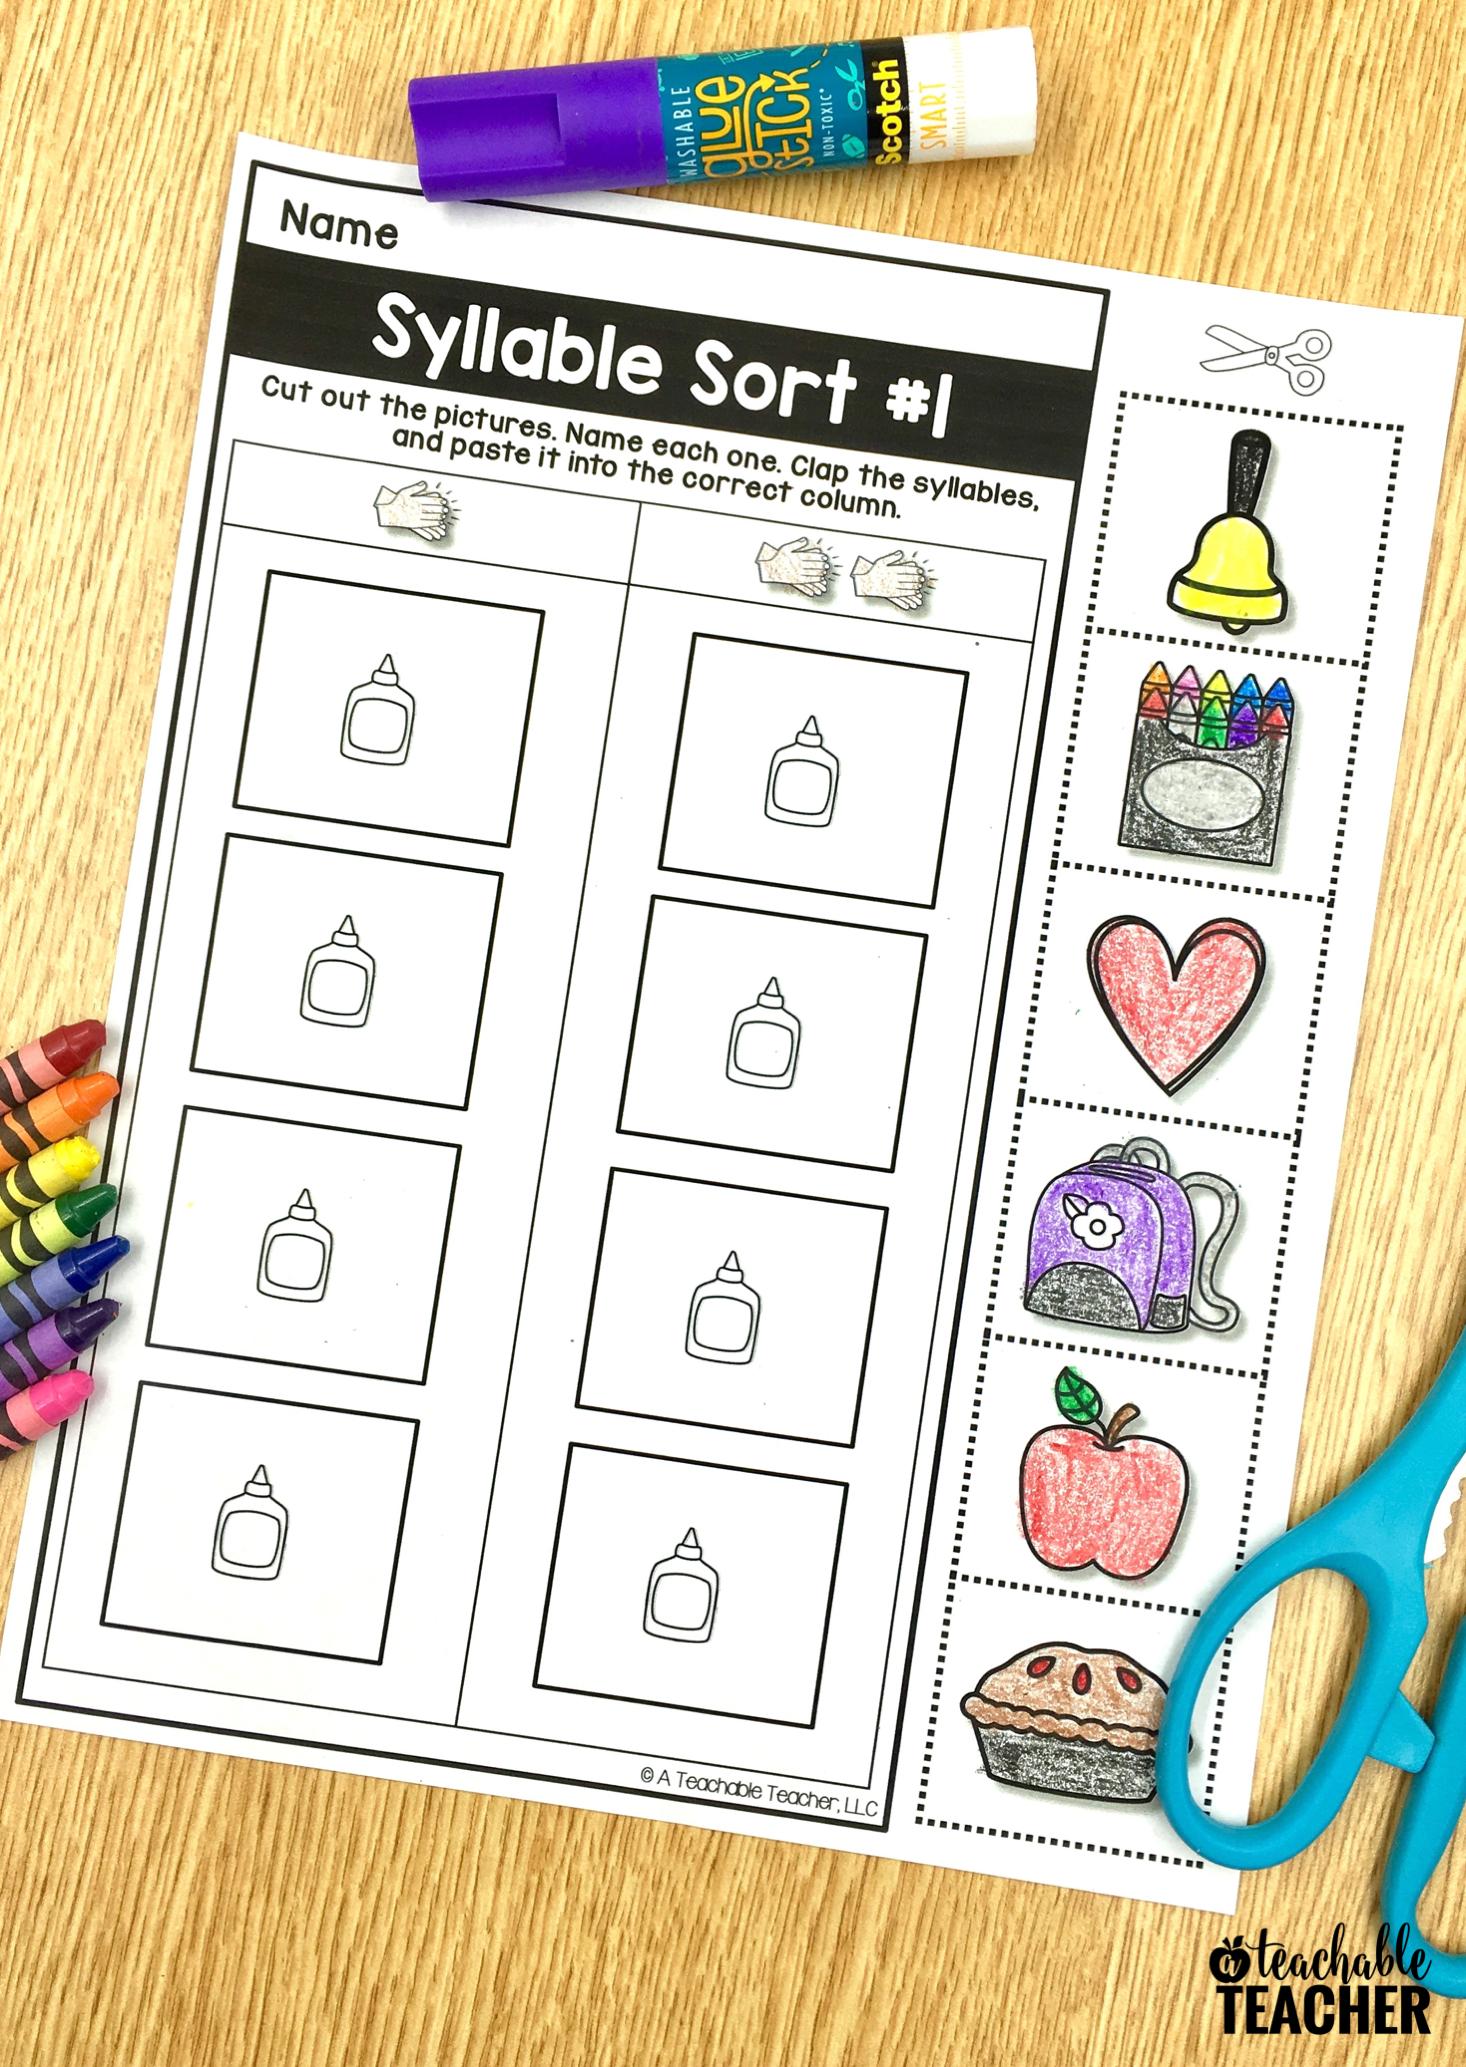 Free Phonemic Awareness Worksheets Interactive And Picture Based Phonemic Awareness Syllable Sort Kindergarten Syllable Sort [ 2067 x 1466 Pixel ]